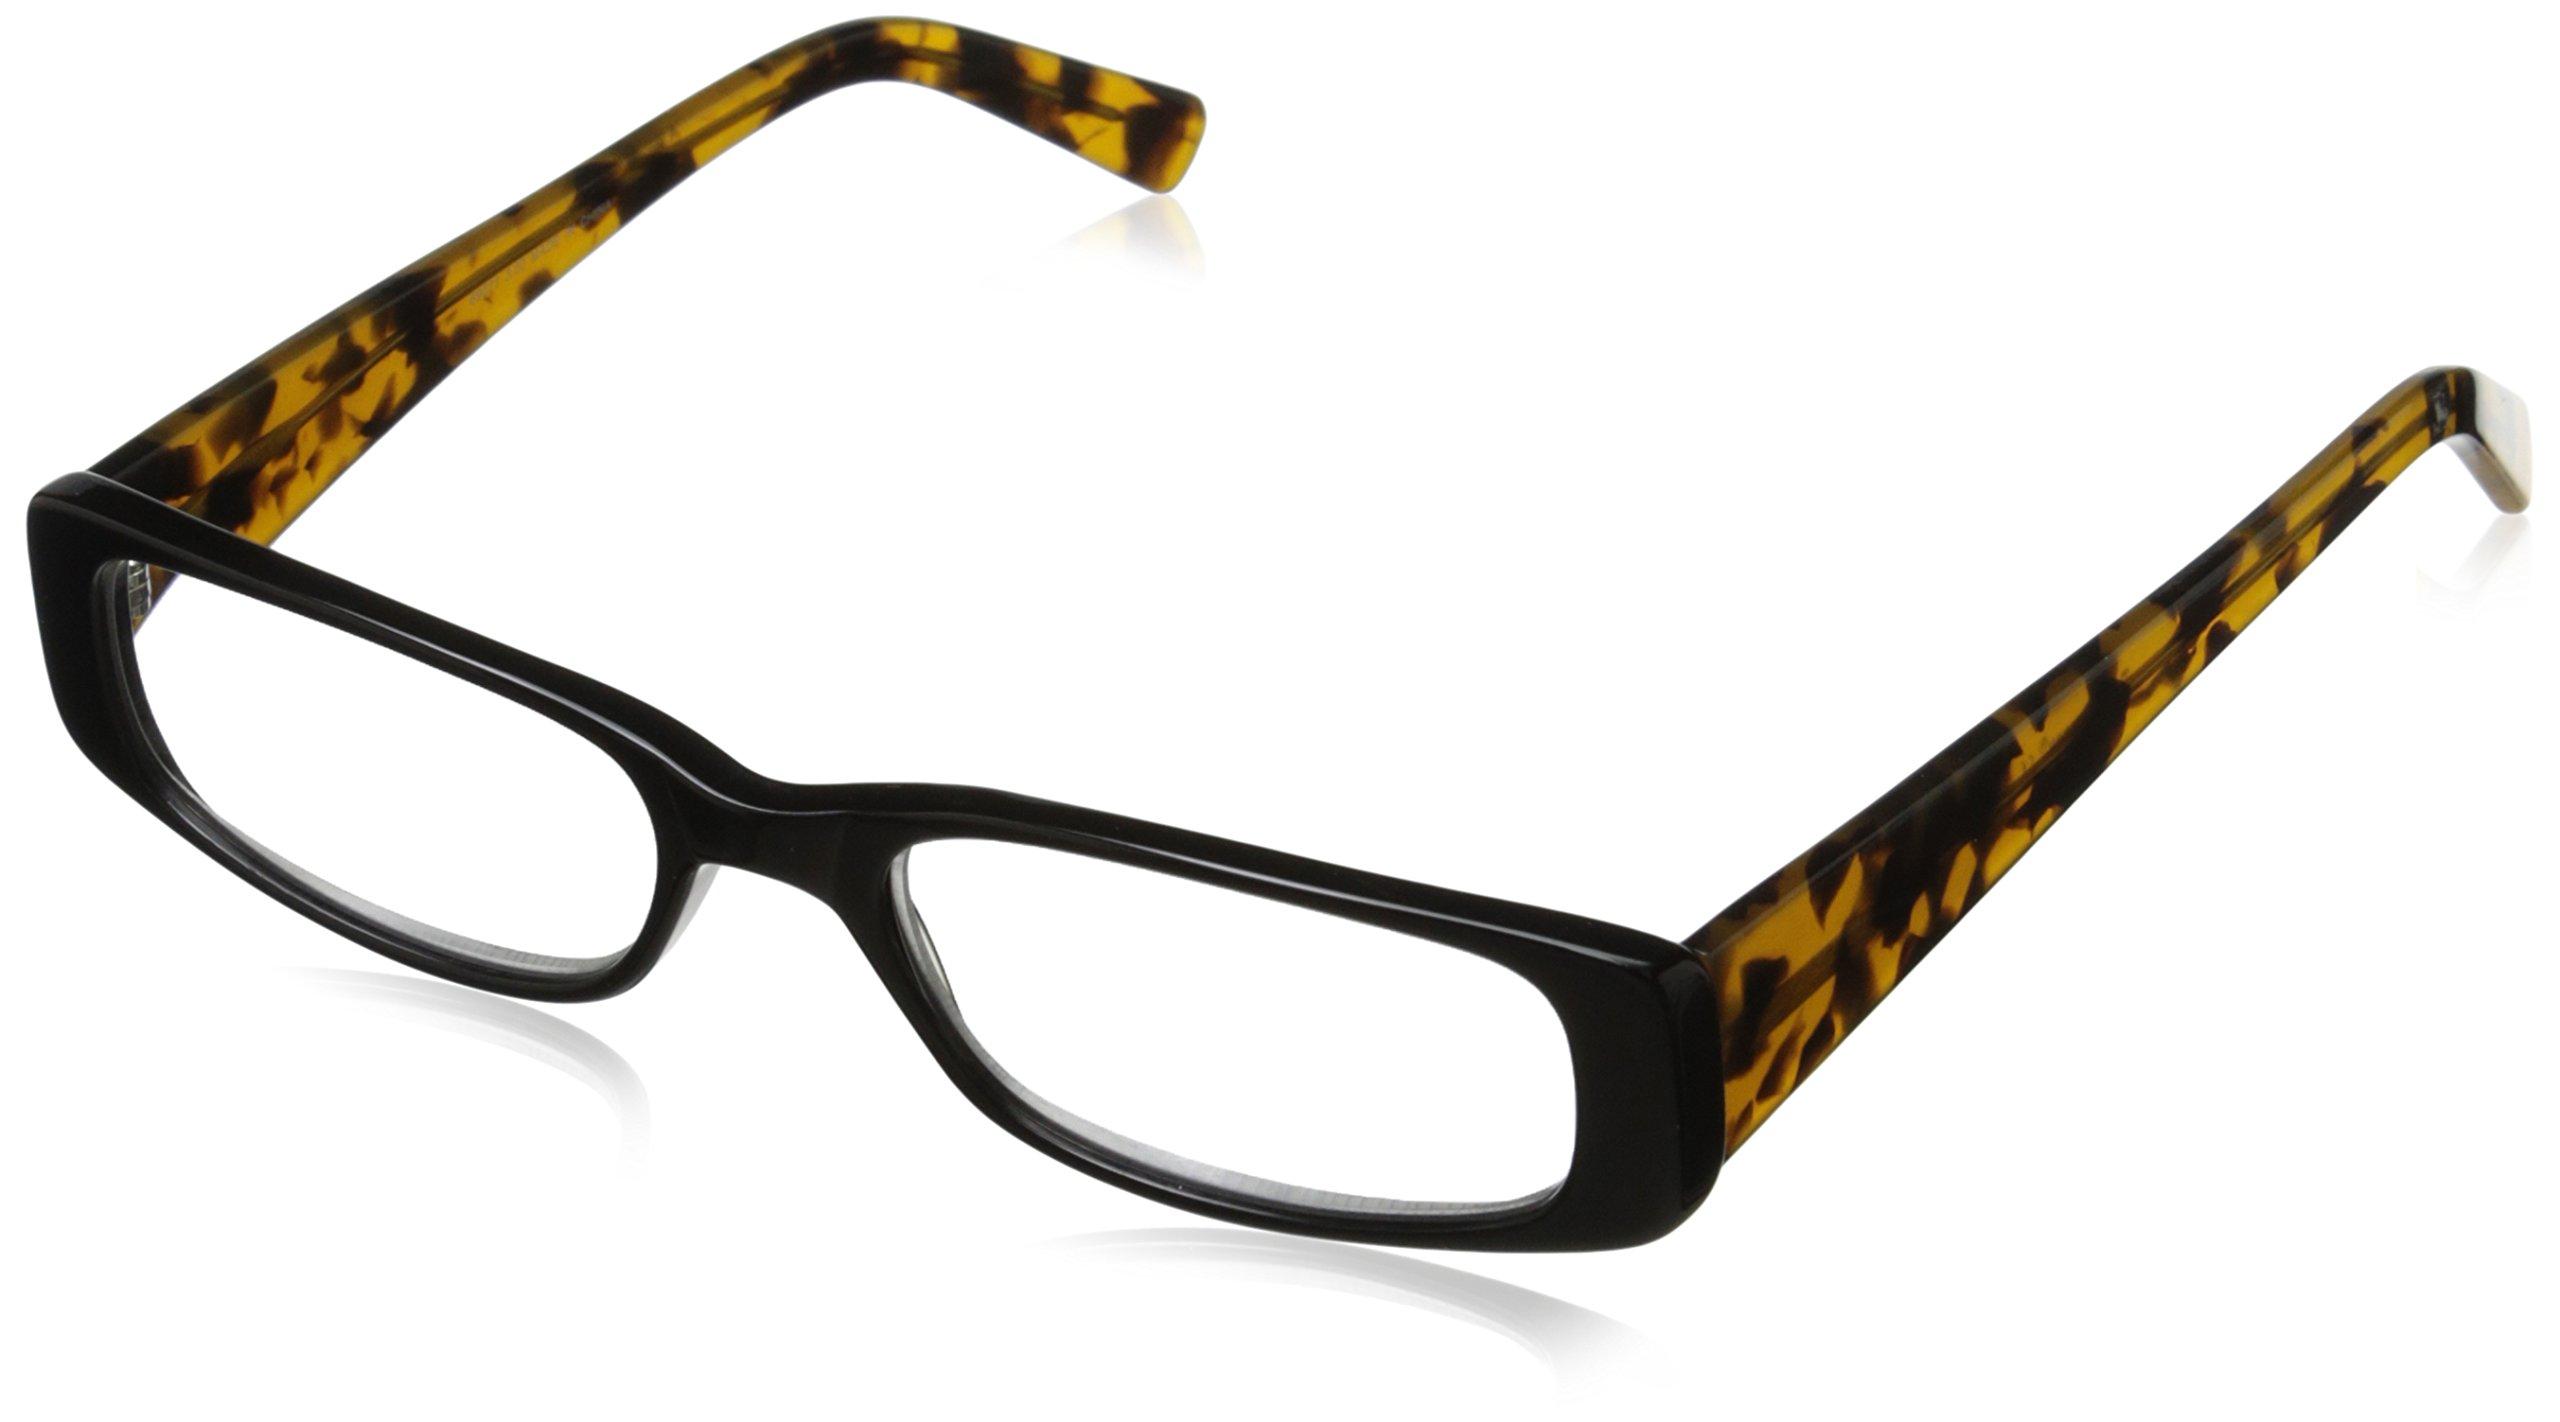 A.J. Morgan Women's Tammy Rectangular Reading Glasses, Black & Tortoise, 3